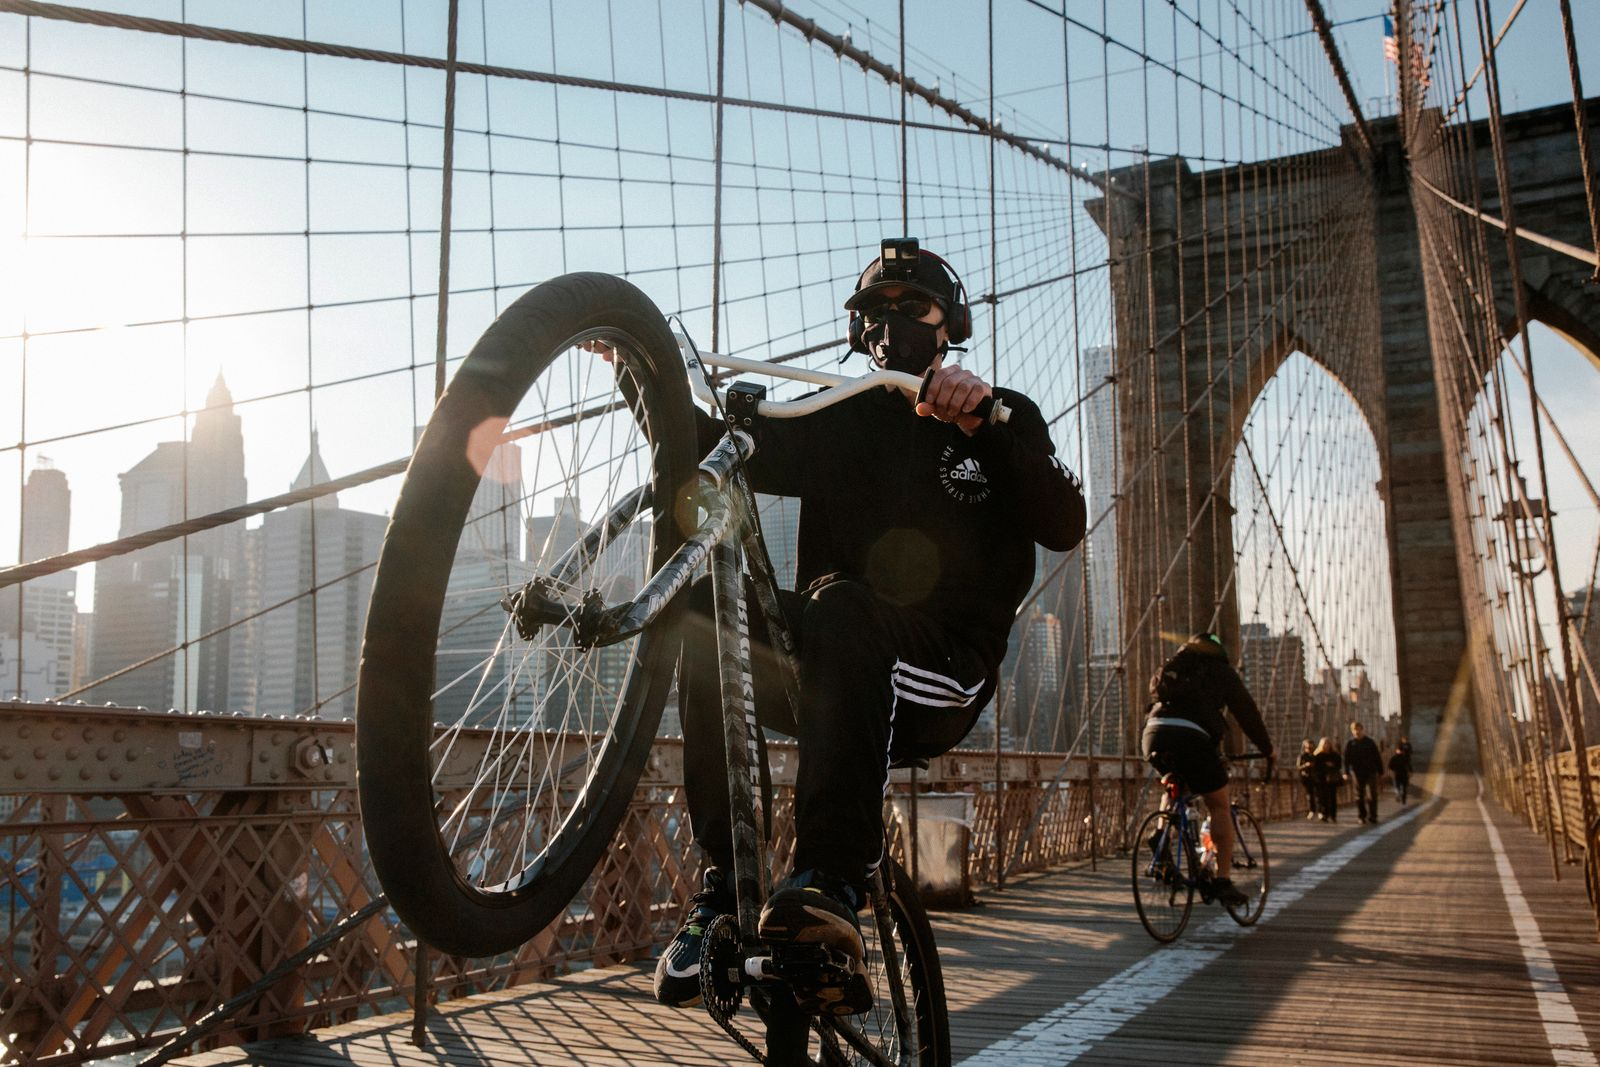 A cyclist pops a wheelie on the Brooklyn Bridge in New York, March 26, 2020. (Mark Abramson/The New York Times)